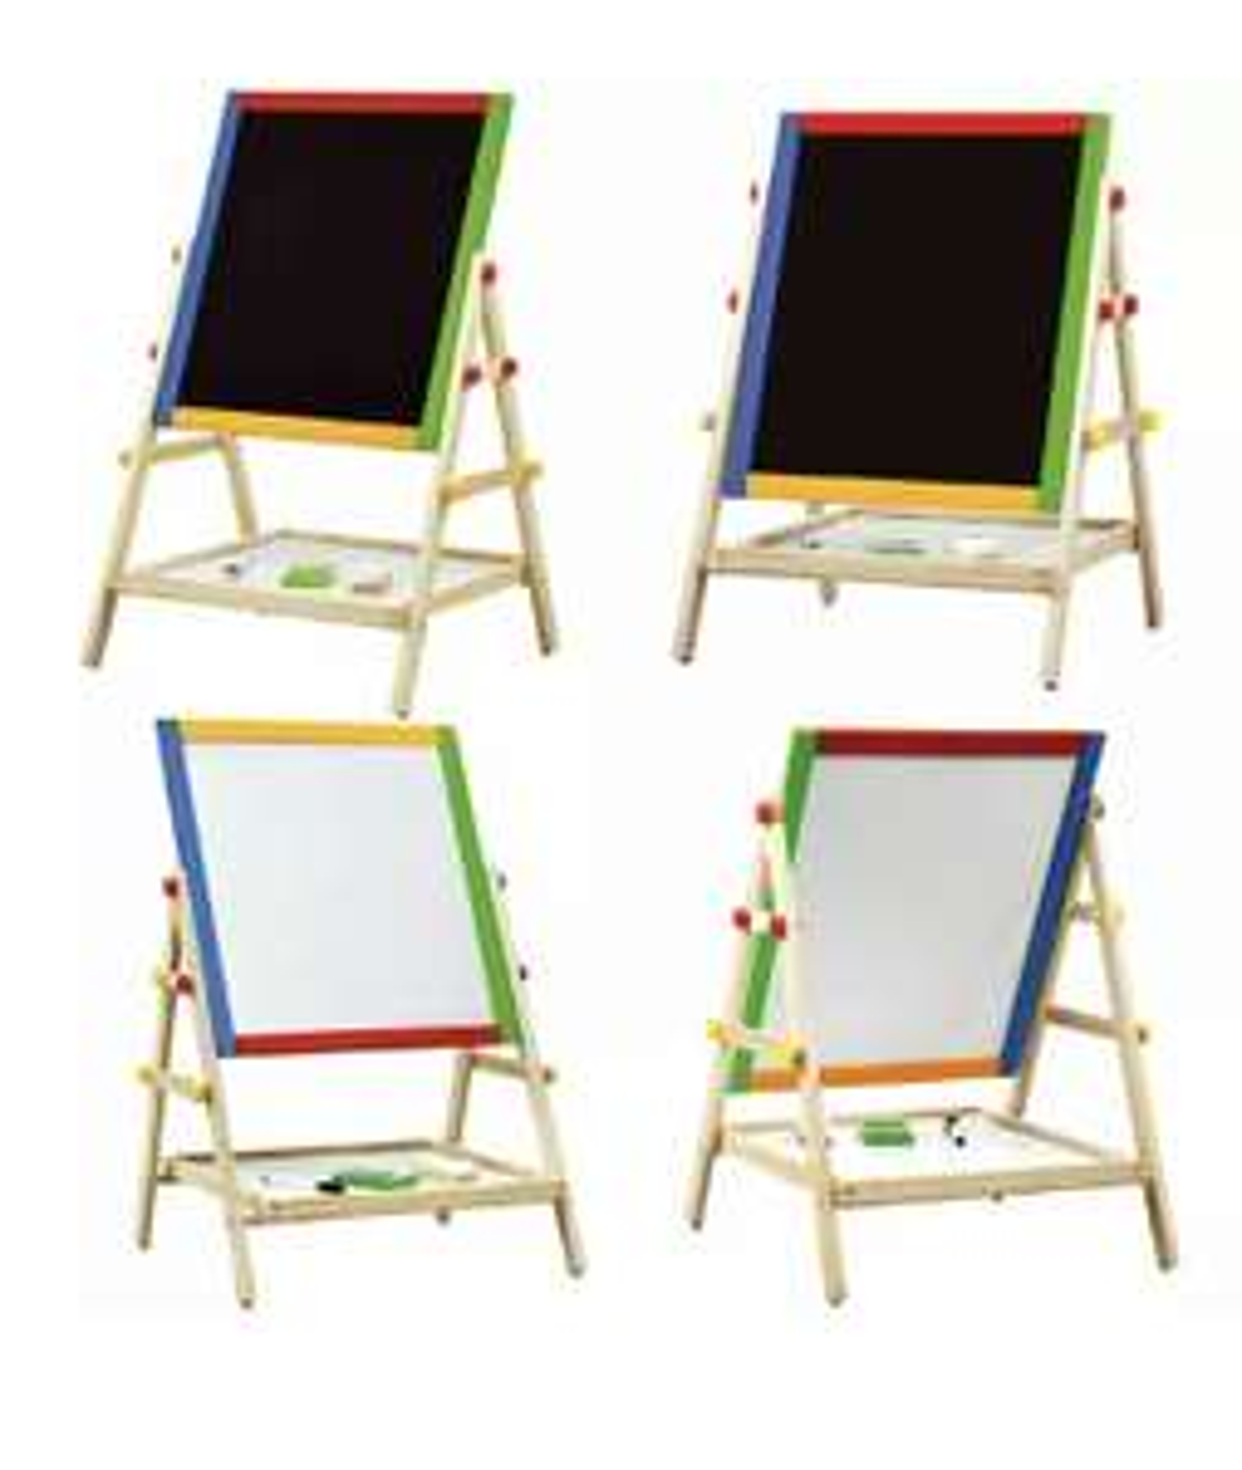 2 in 1 White Board other side Black Board 66x40x38cm scanning for 10p in Tesco (Shettleston)